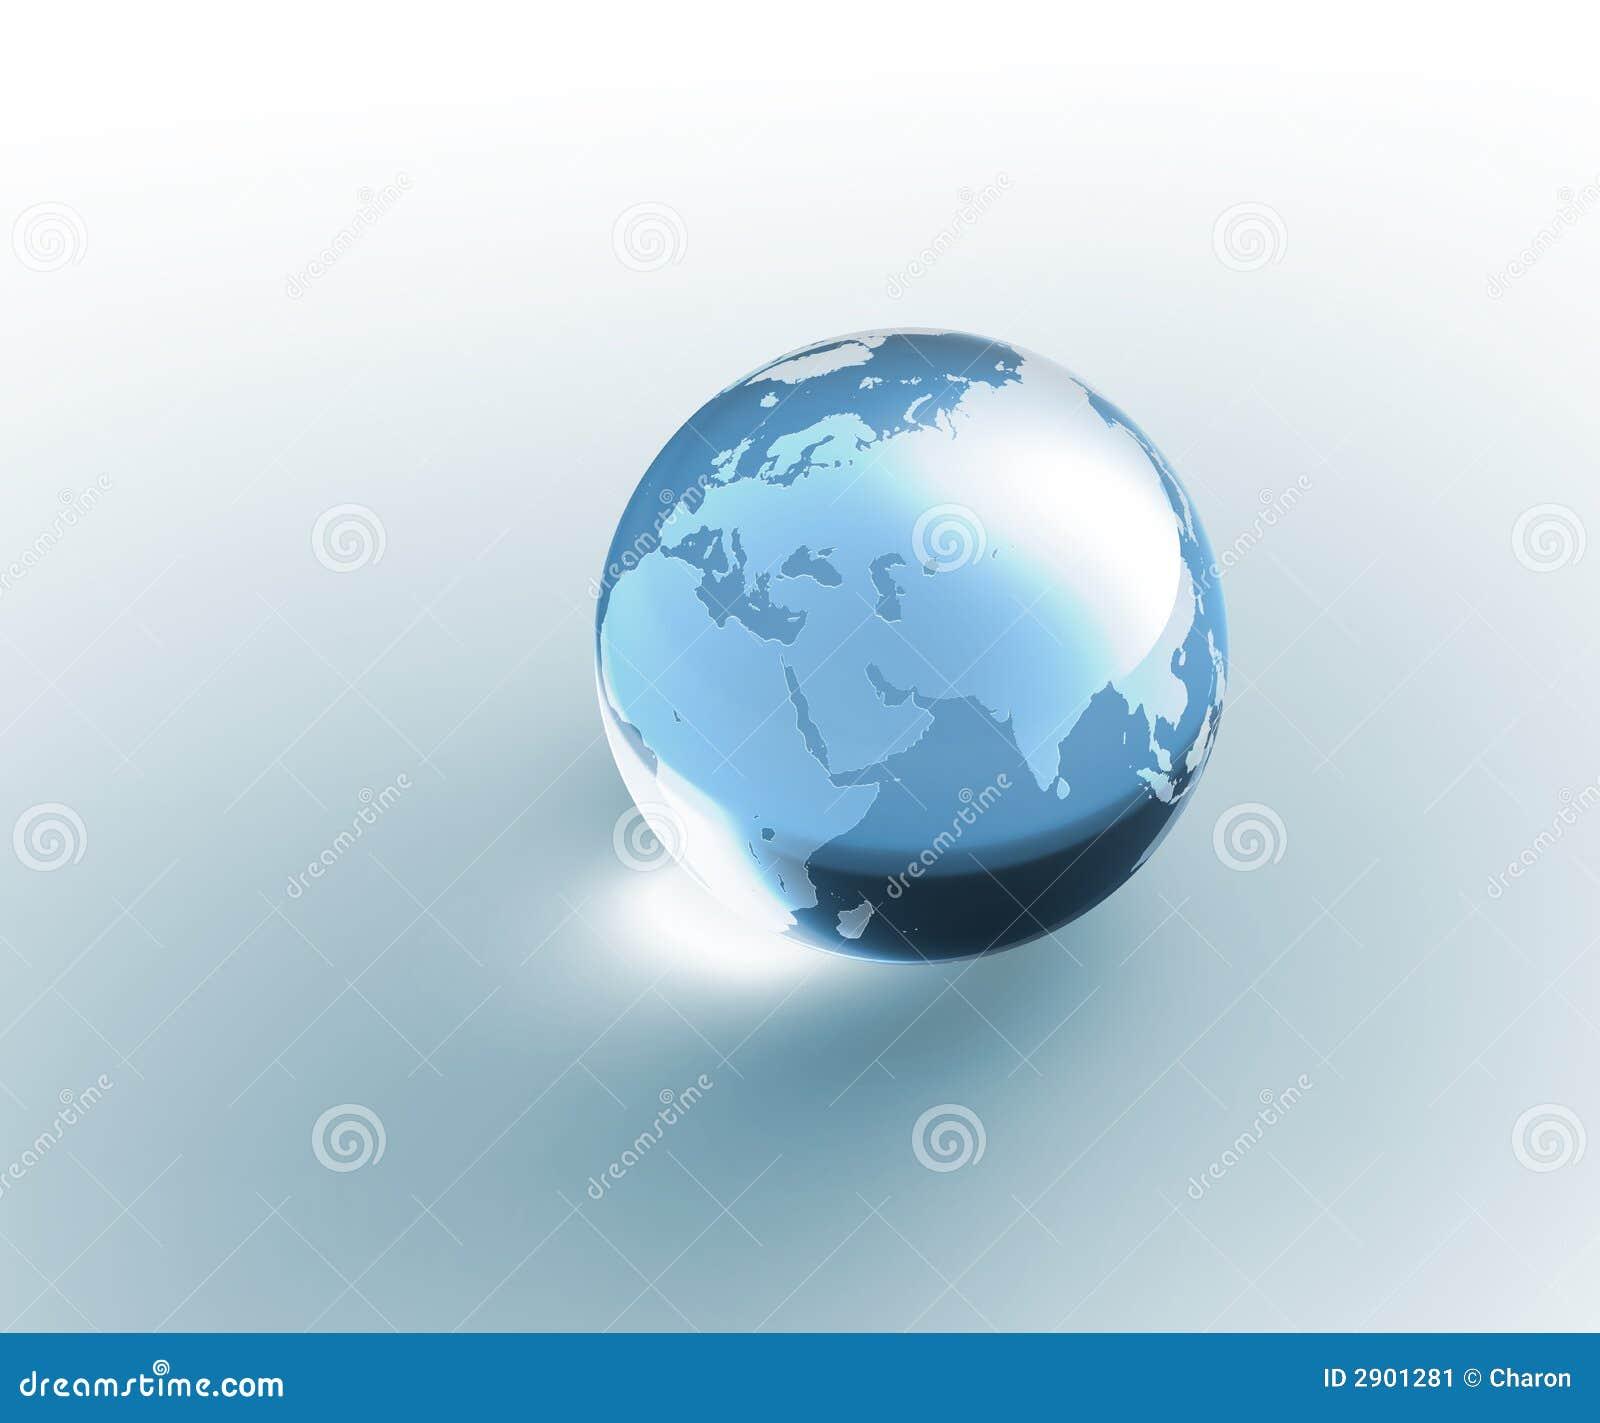 Another World Glass Ball